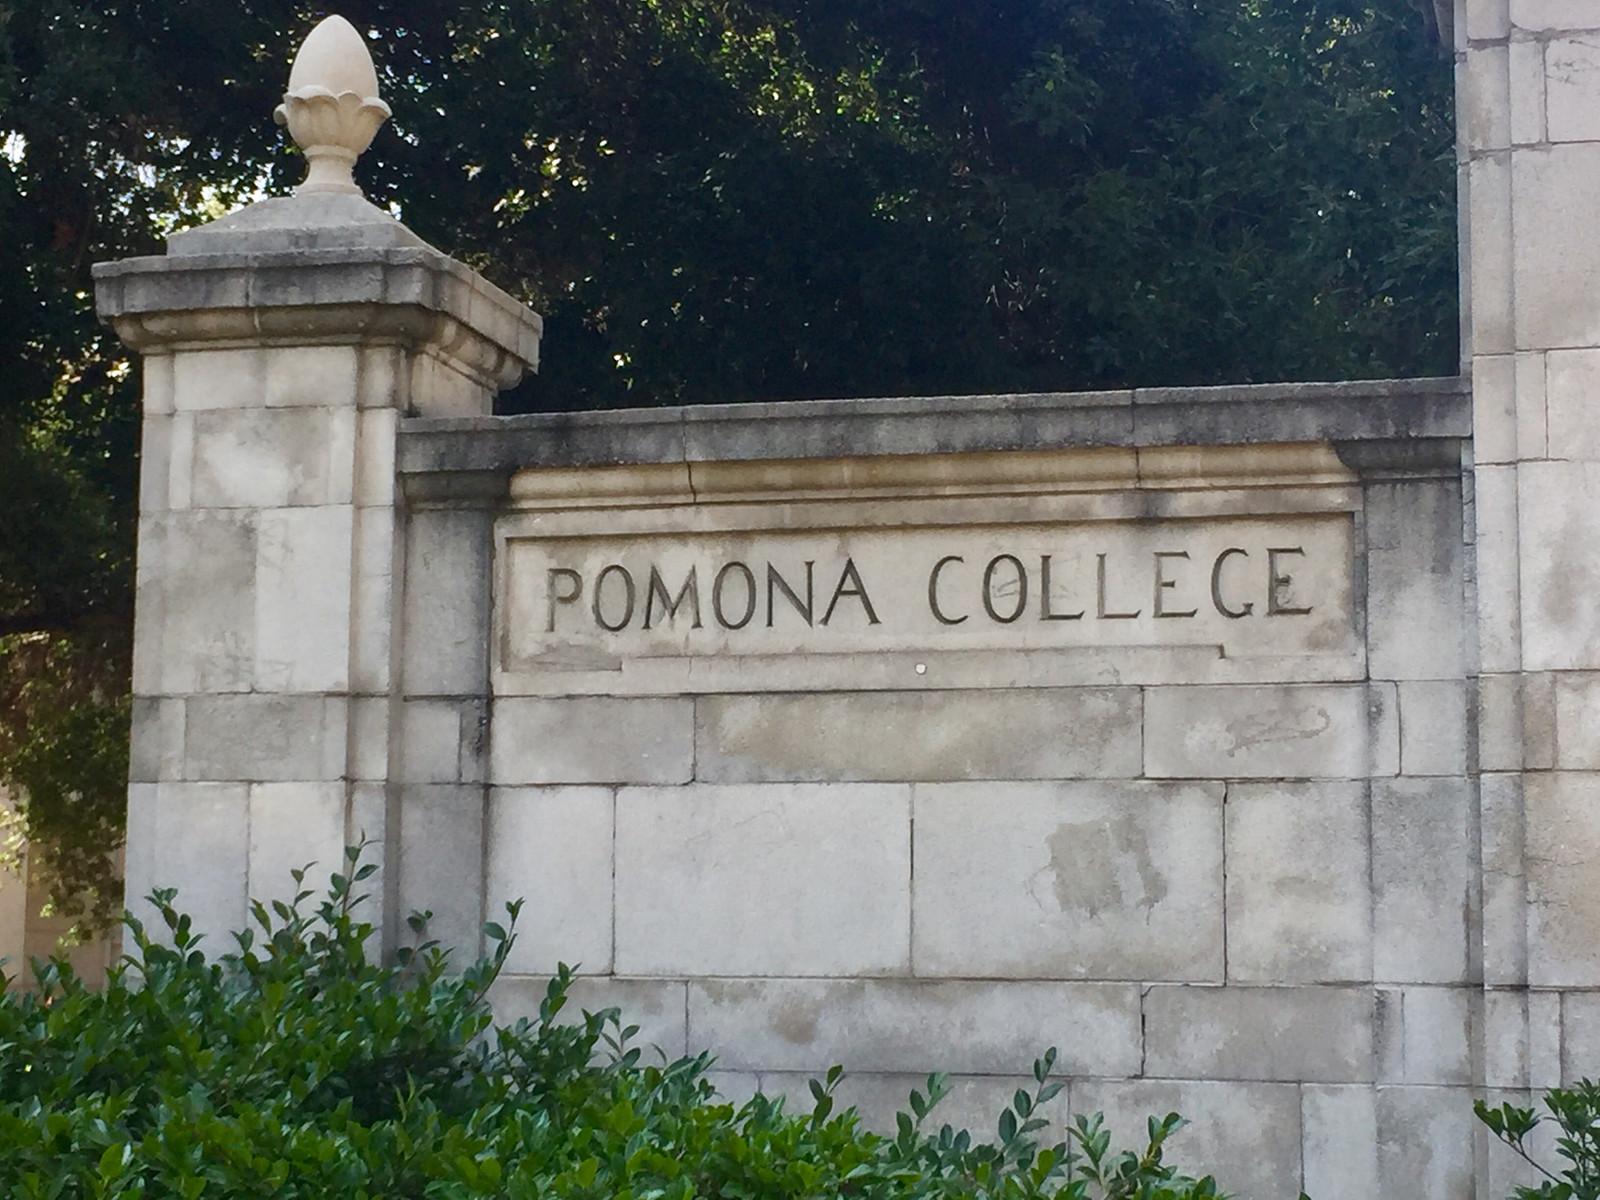 wrightcc   The Claremont Colleges